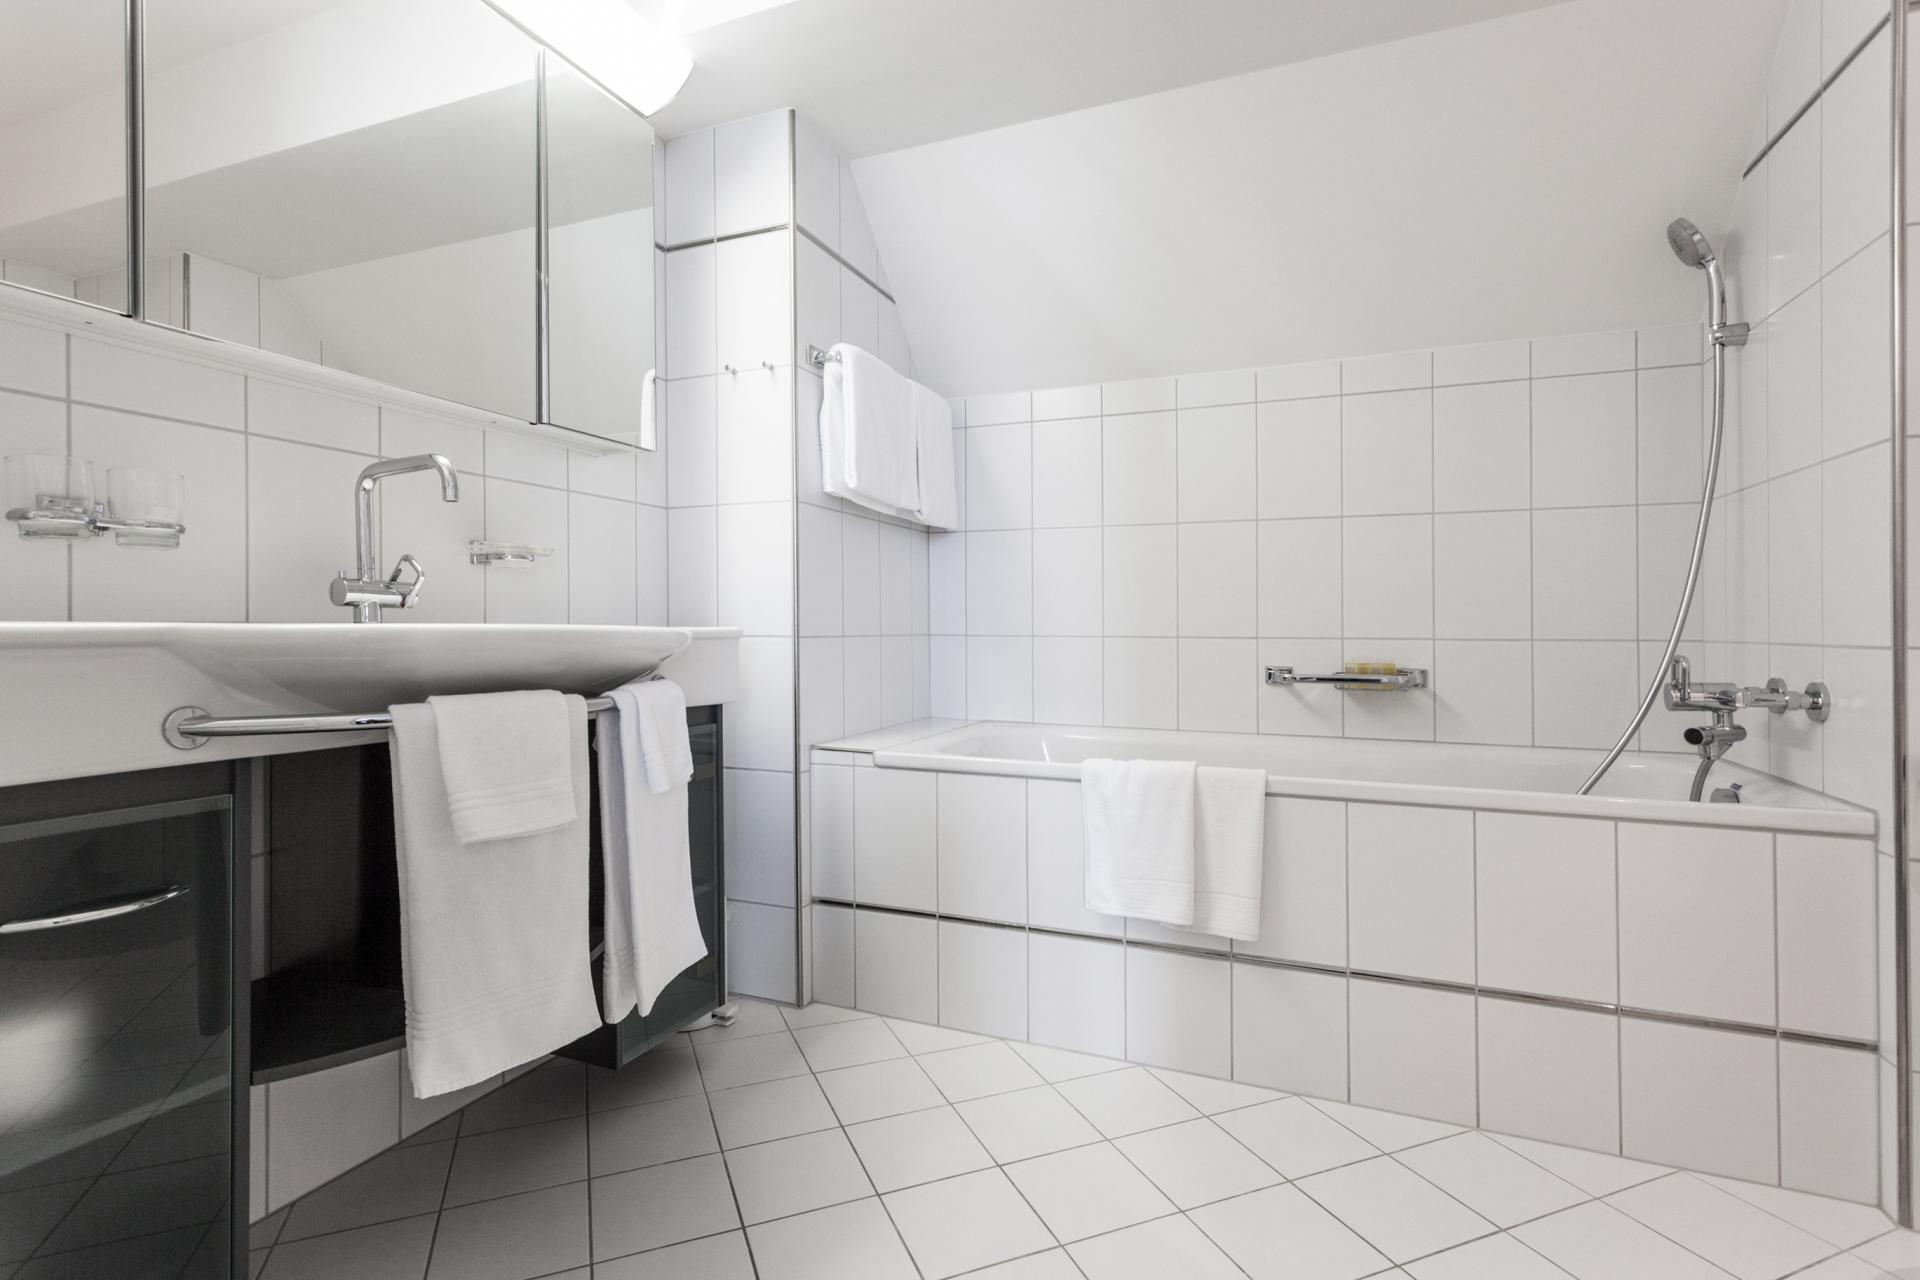 Bathroom at Florastrasse 26 Apartments